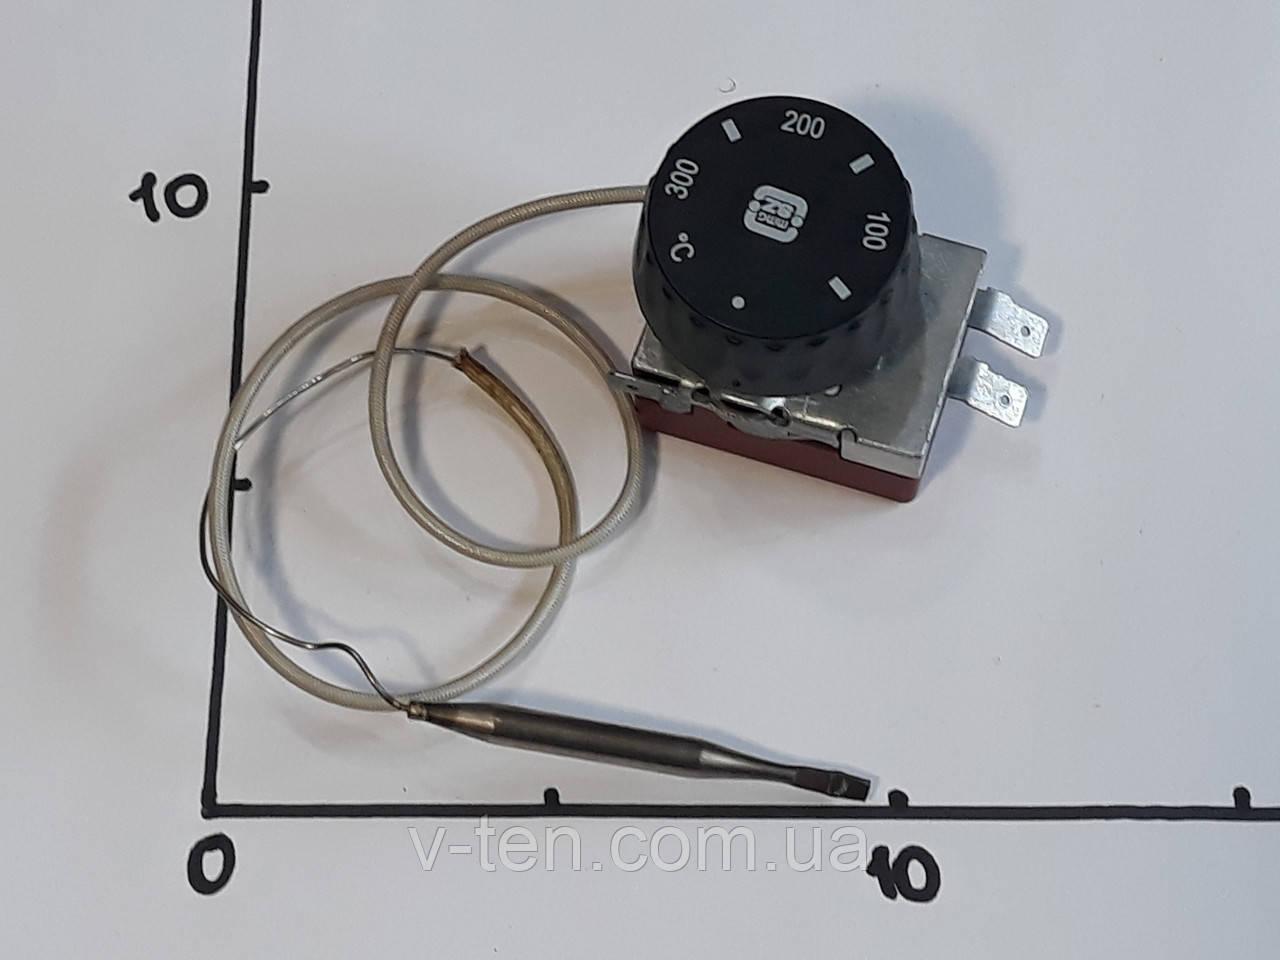 Терморегулятор 50-300°C капиллярный MMG (Венгрия)